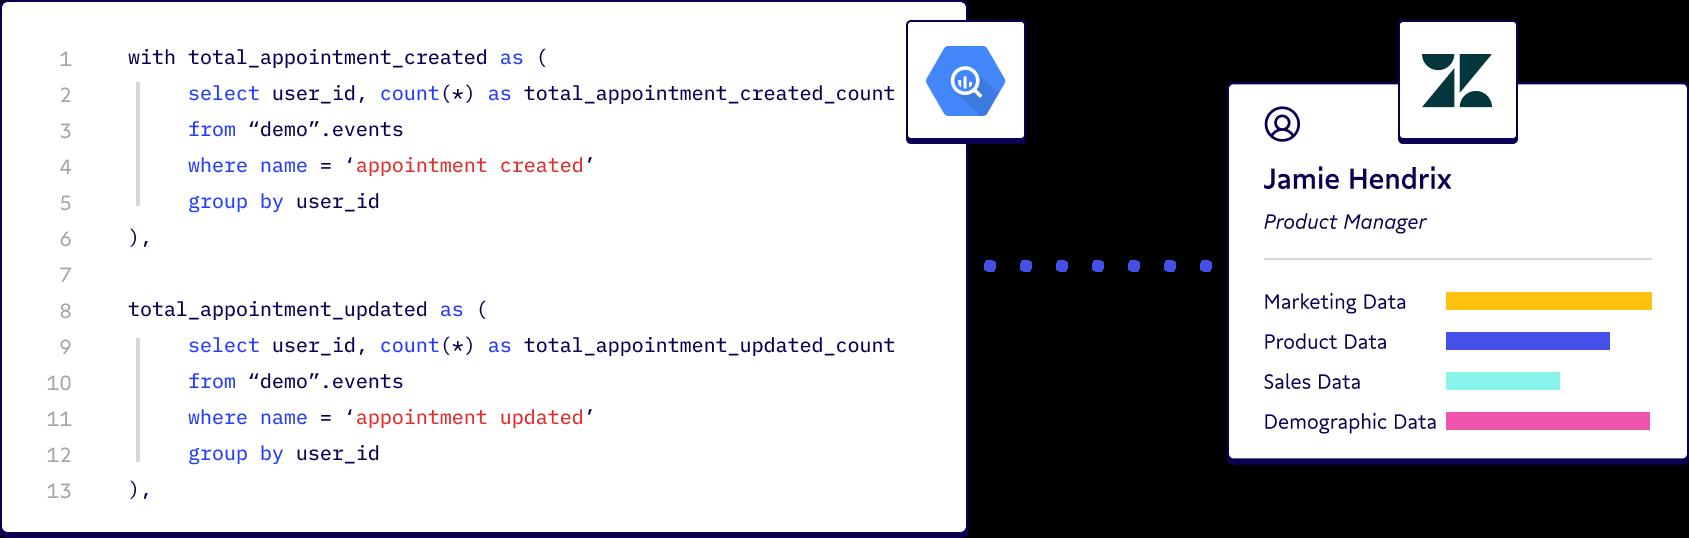 Illustration of SQL BigQuery language displayed as a user profile.